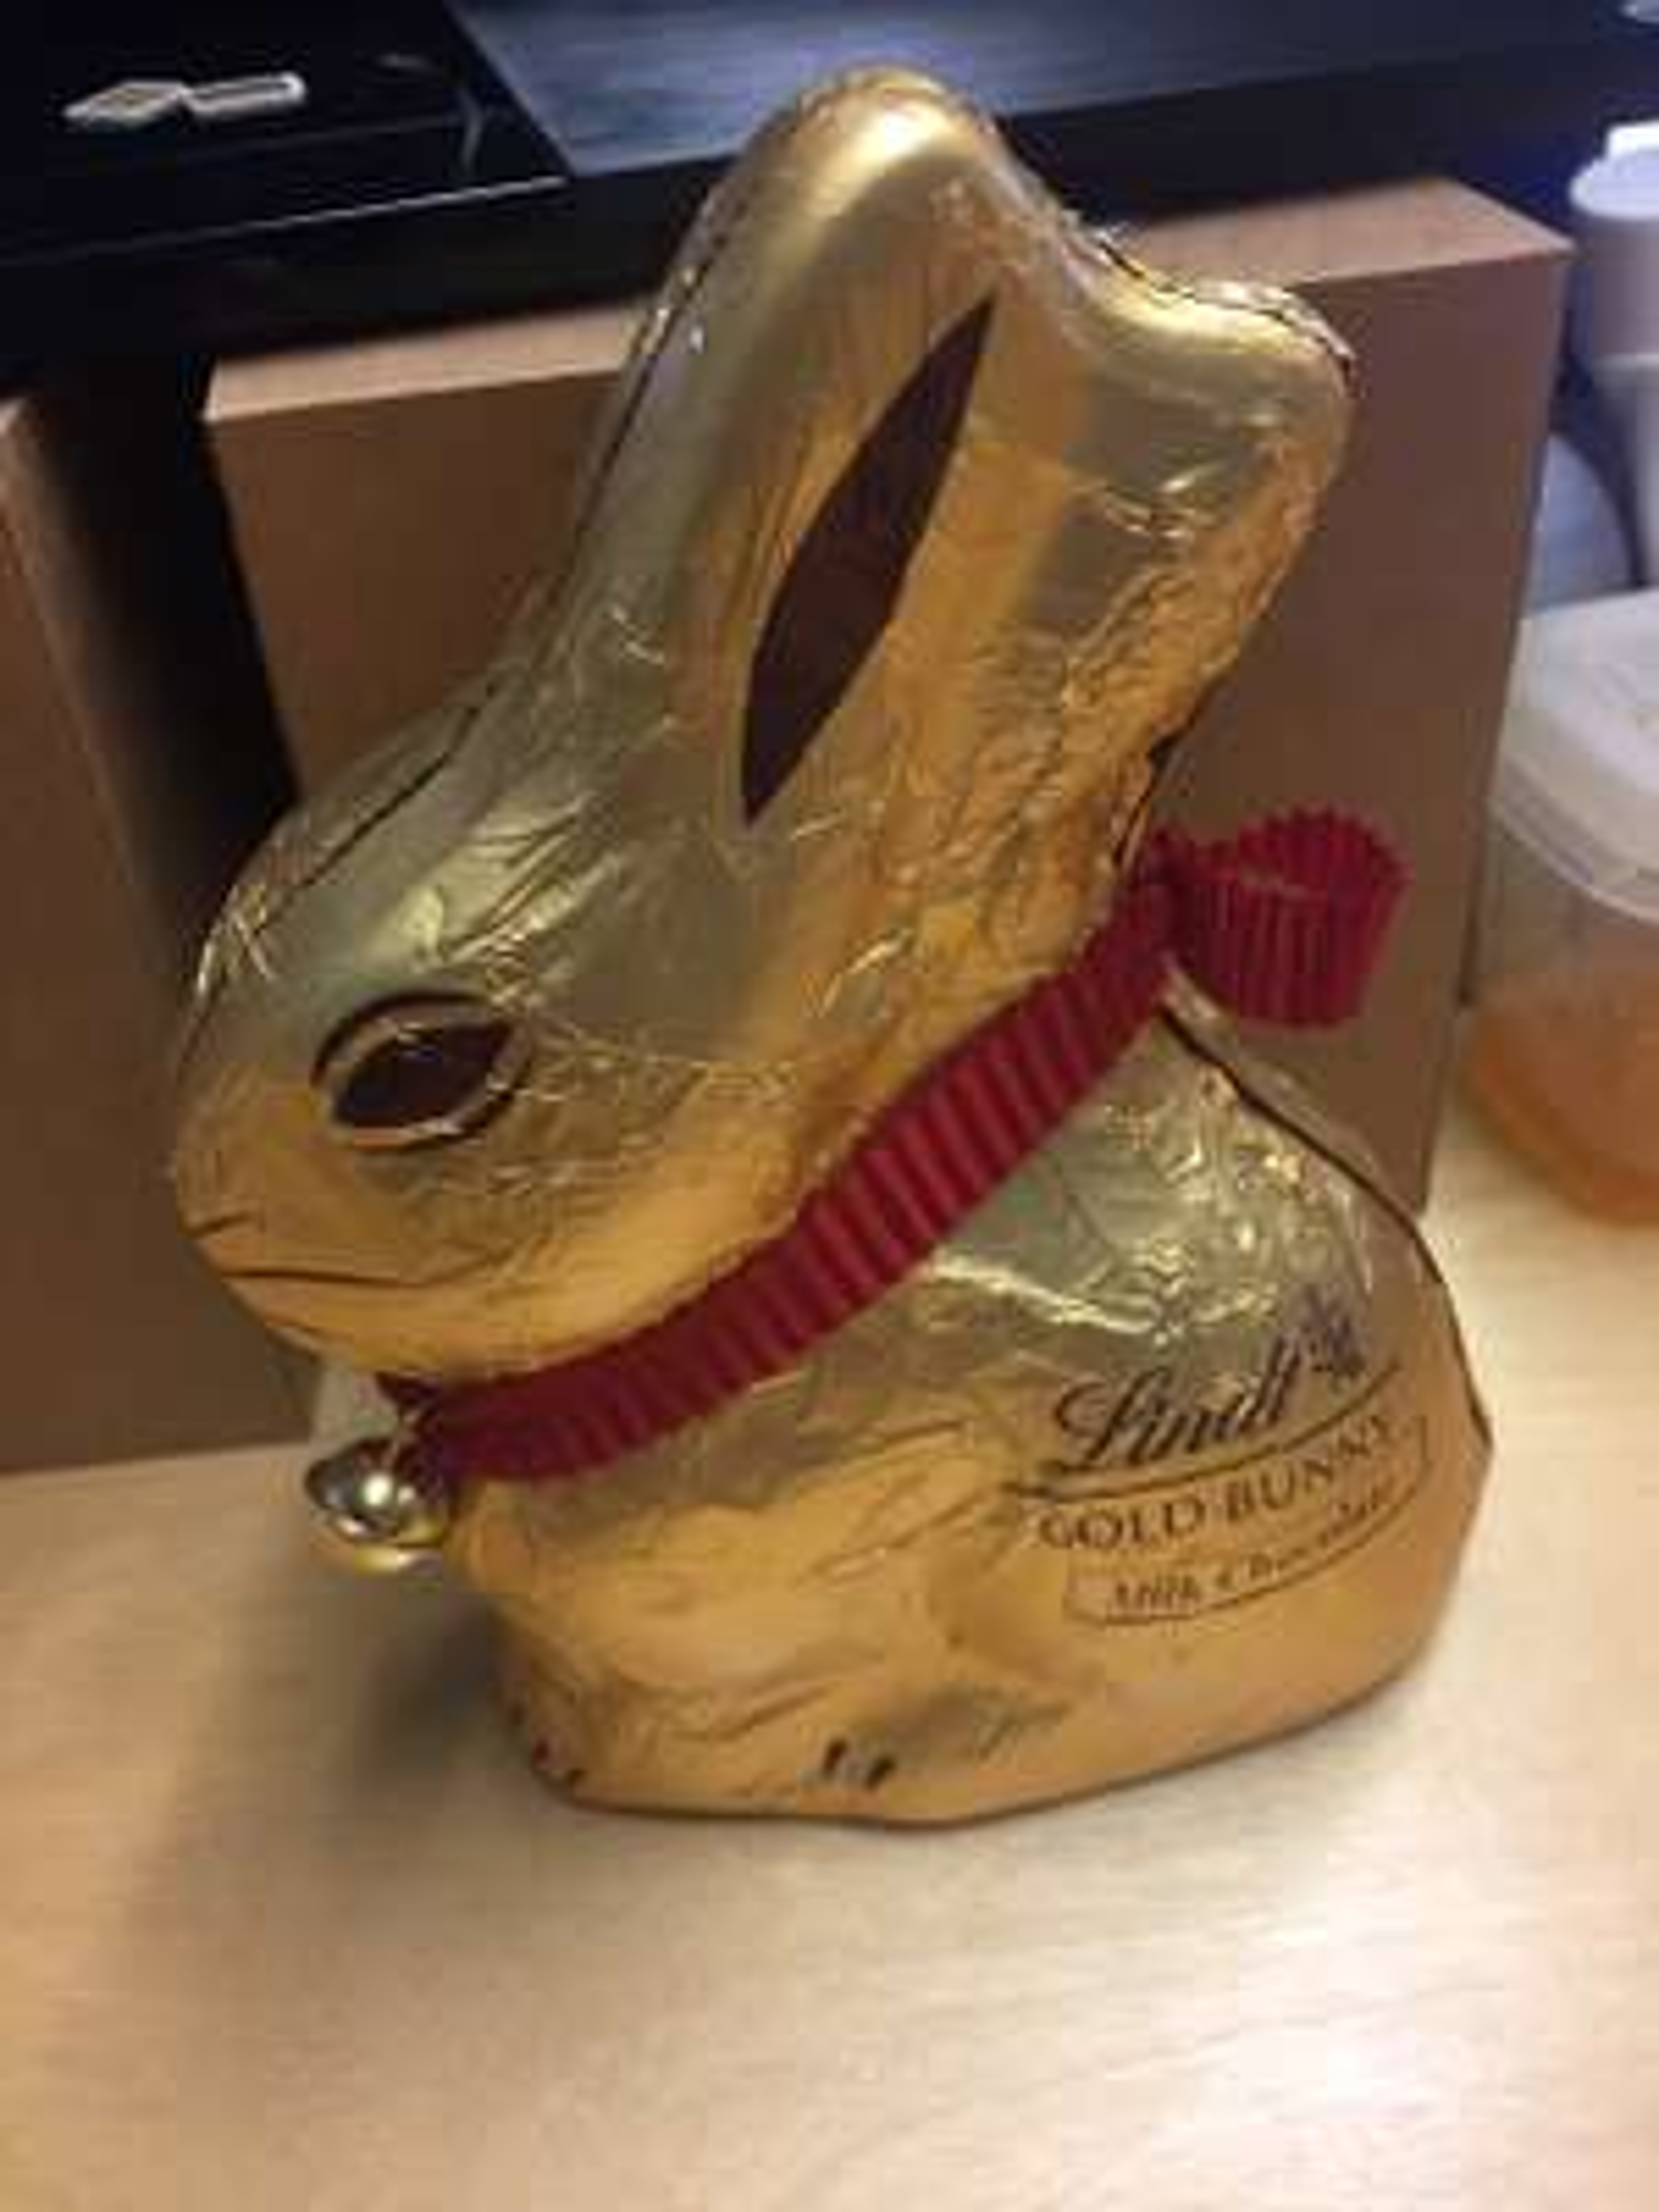 Lindt bunny 15p /£1 / £1.50 instore @ Sainsburys